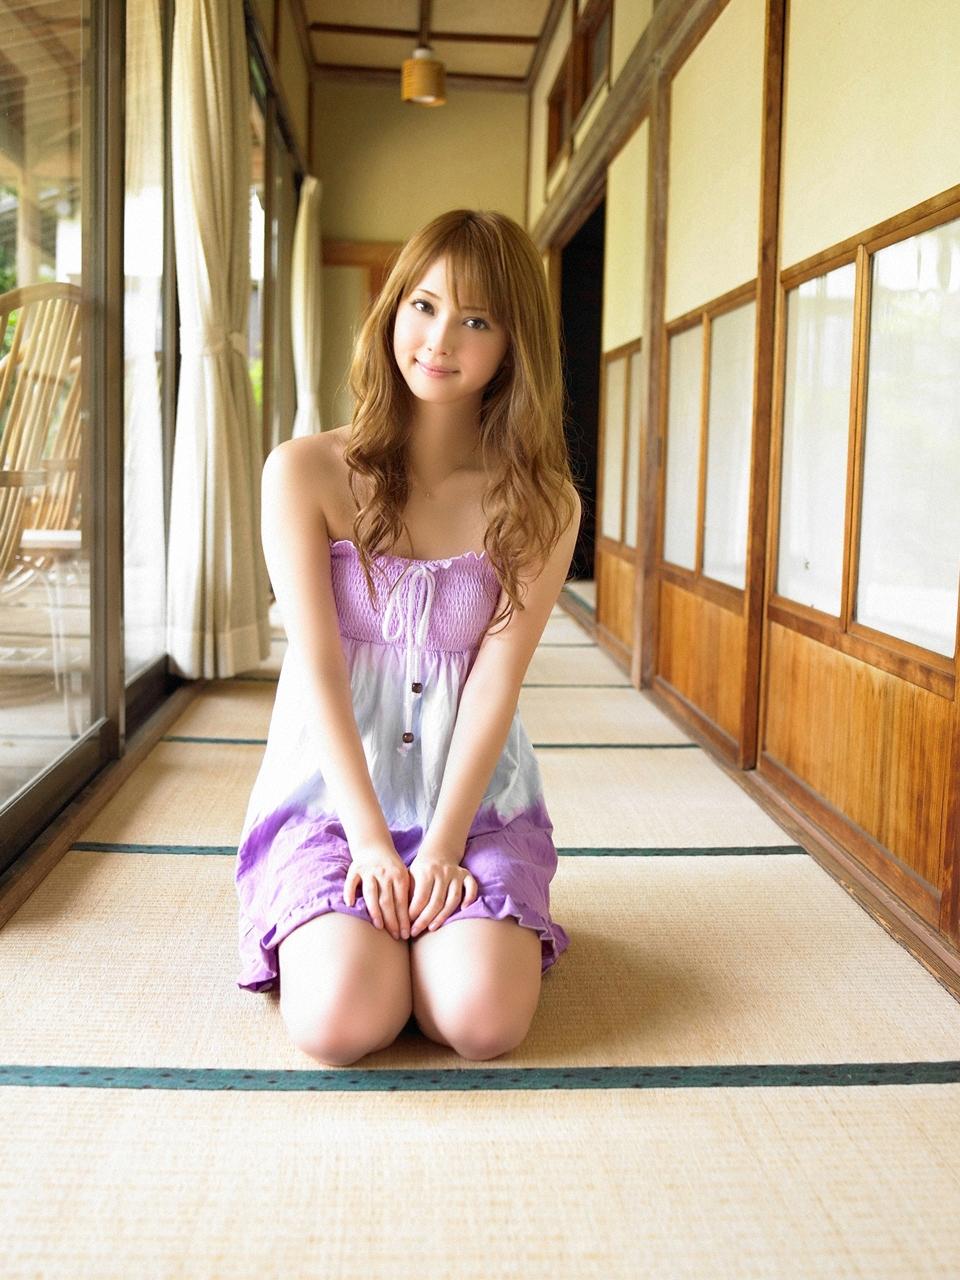 Японские девочки эротика фото 23 фотография